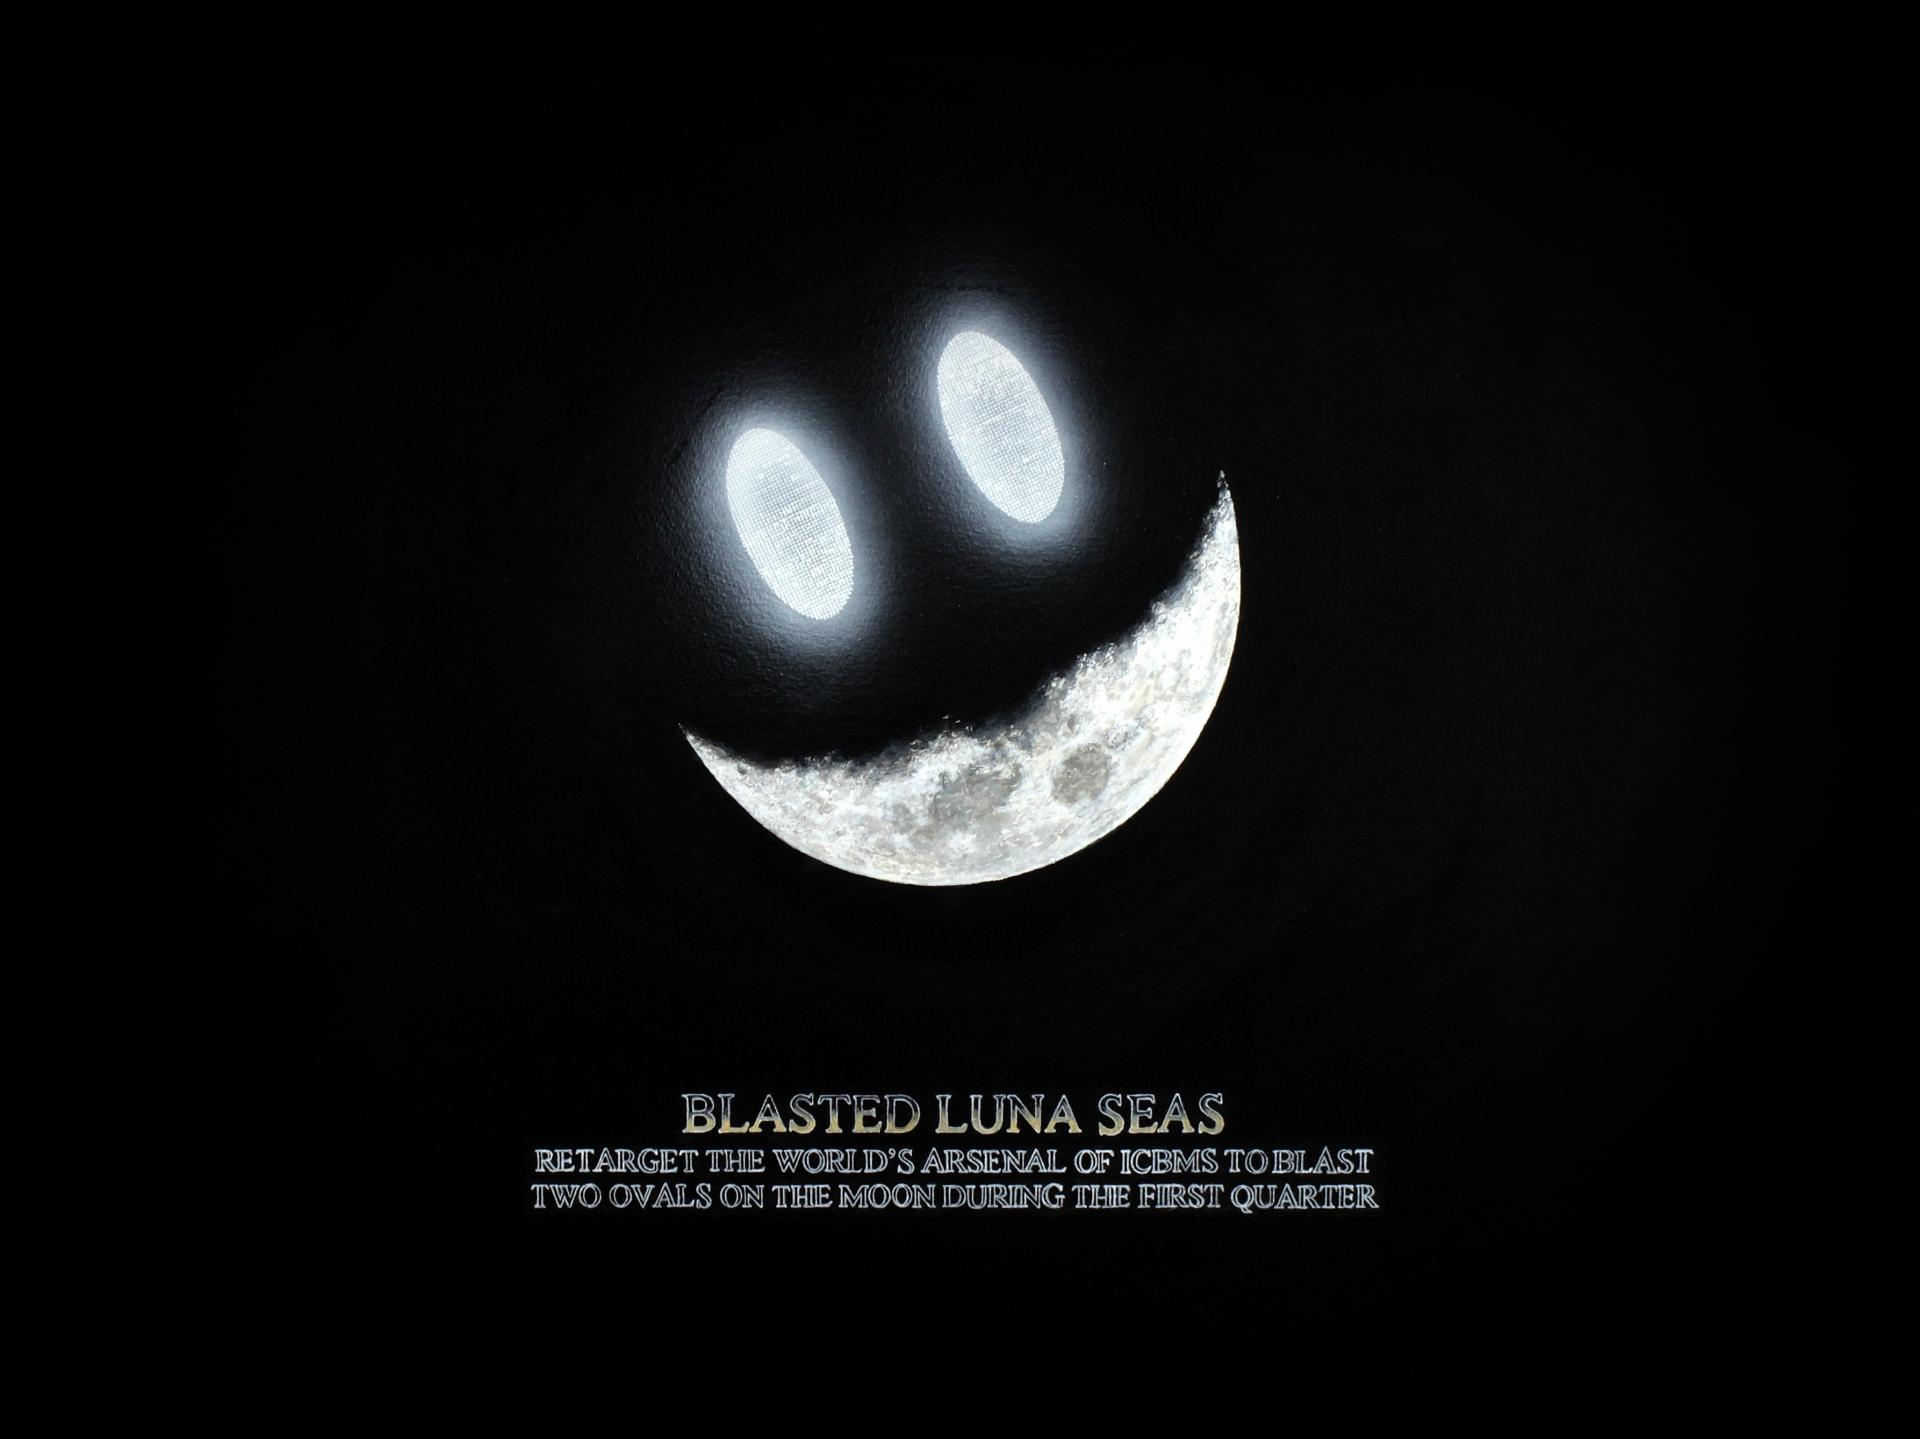 Blasted Luna Seas, 2007, charcoal, acrylic on paper